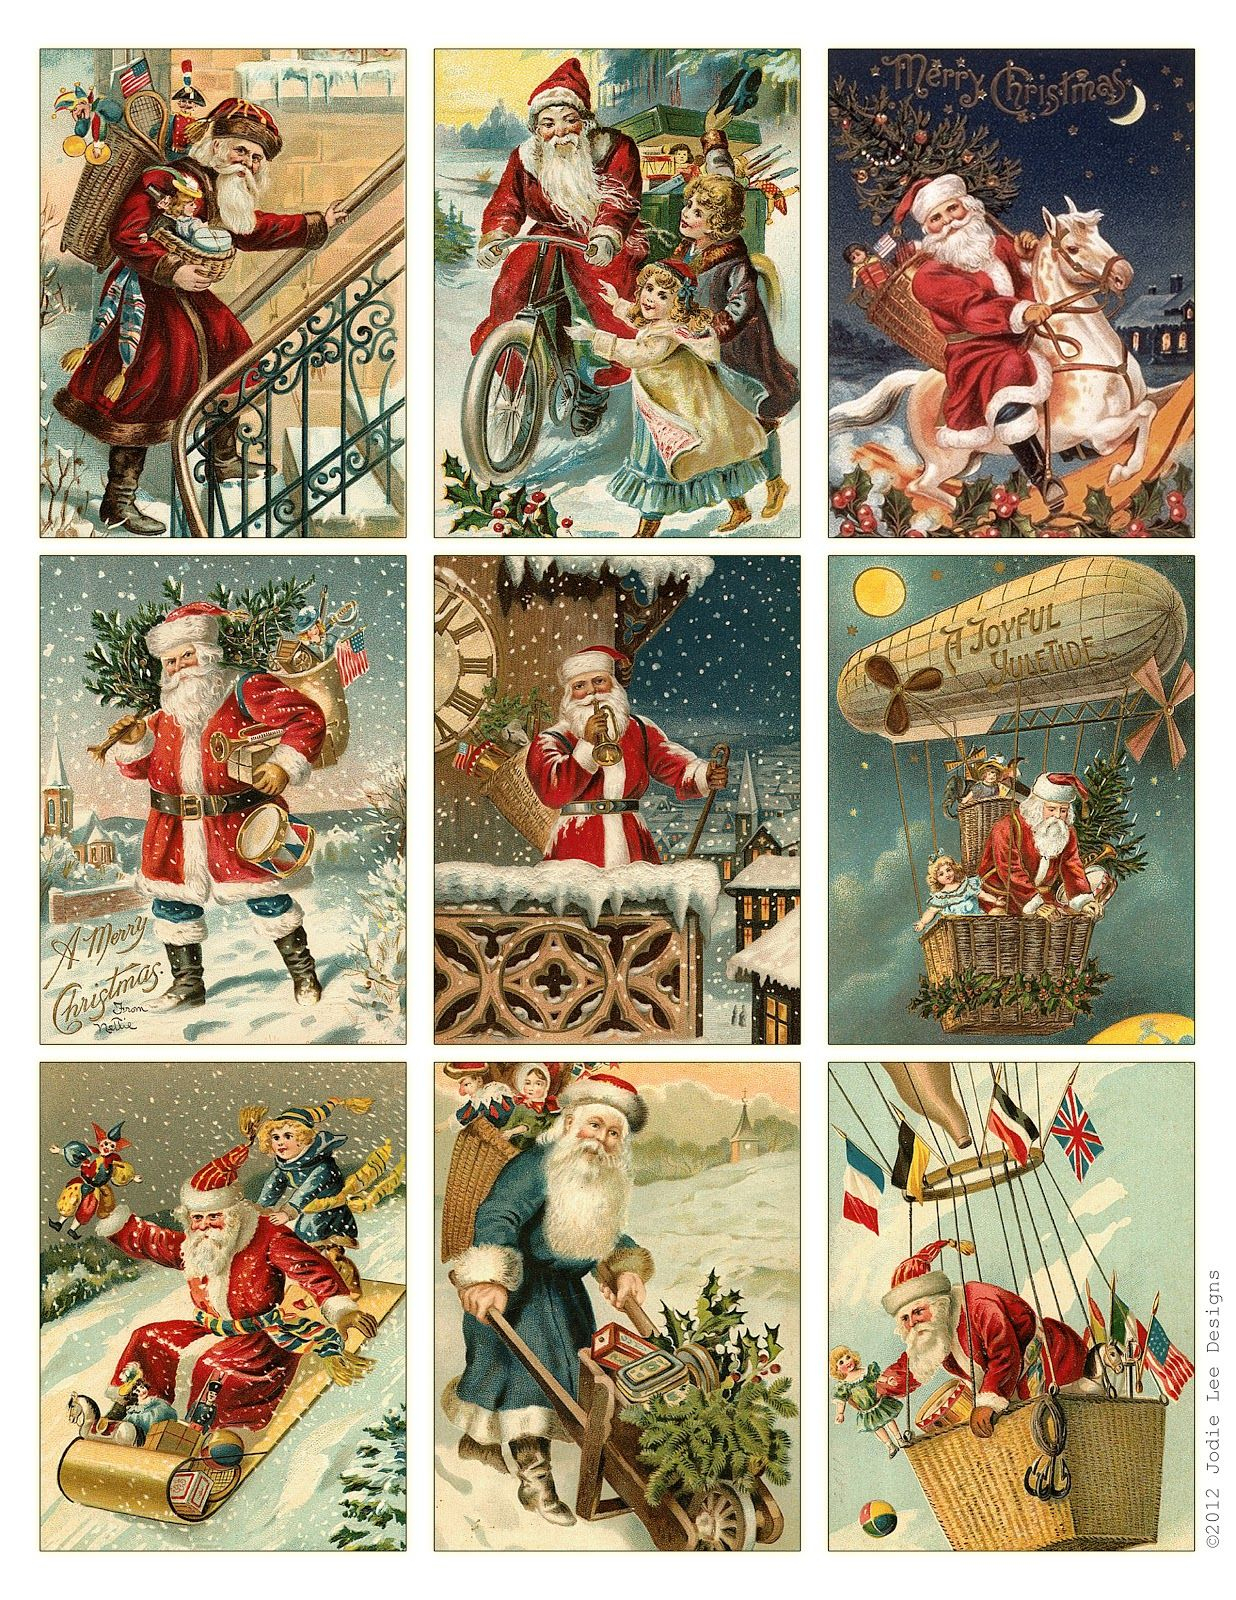 Free To Download! Printable Vintage Santa Tags Or Cards. | Free - Free Printable Vintage Christmas Images